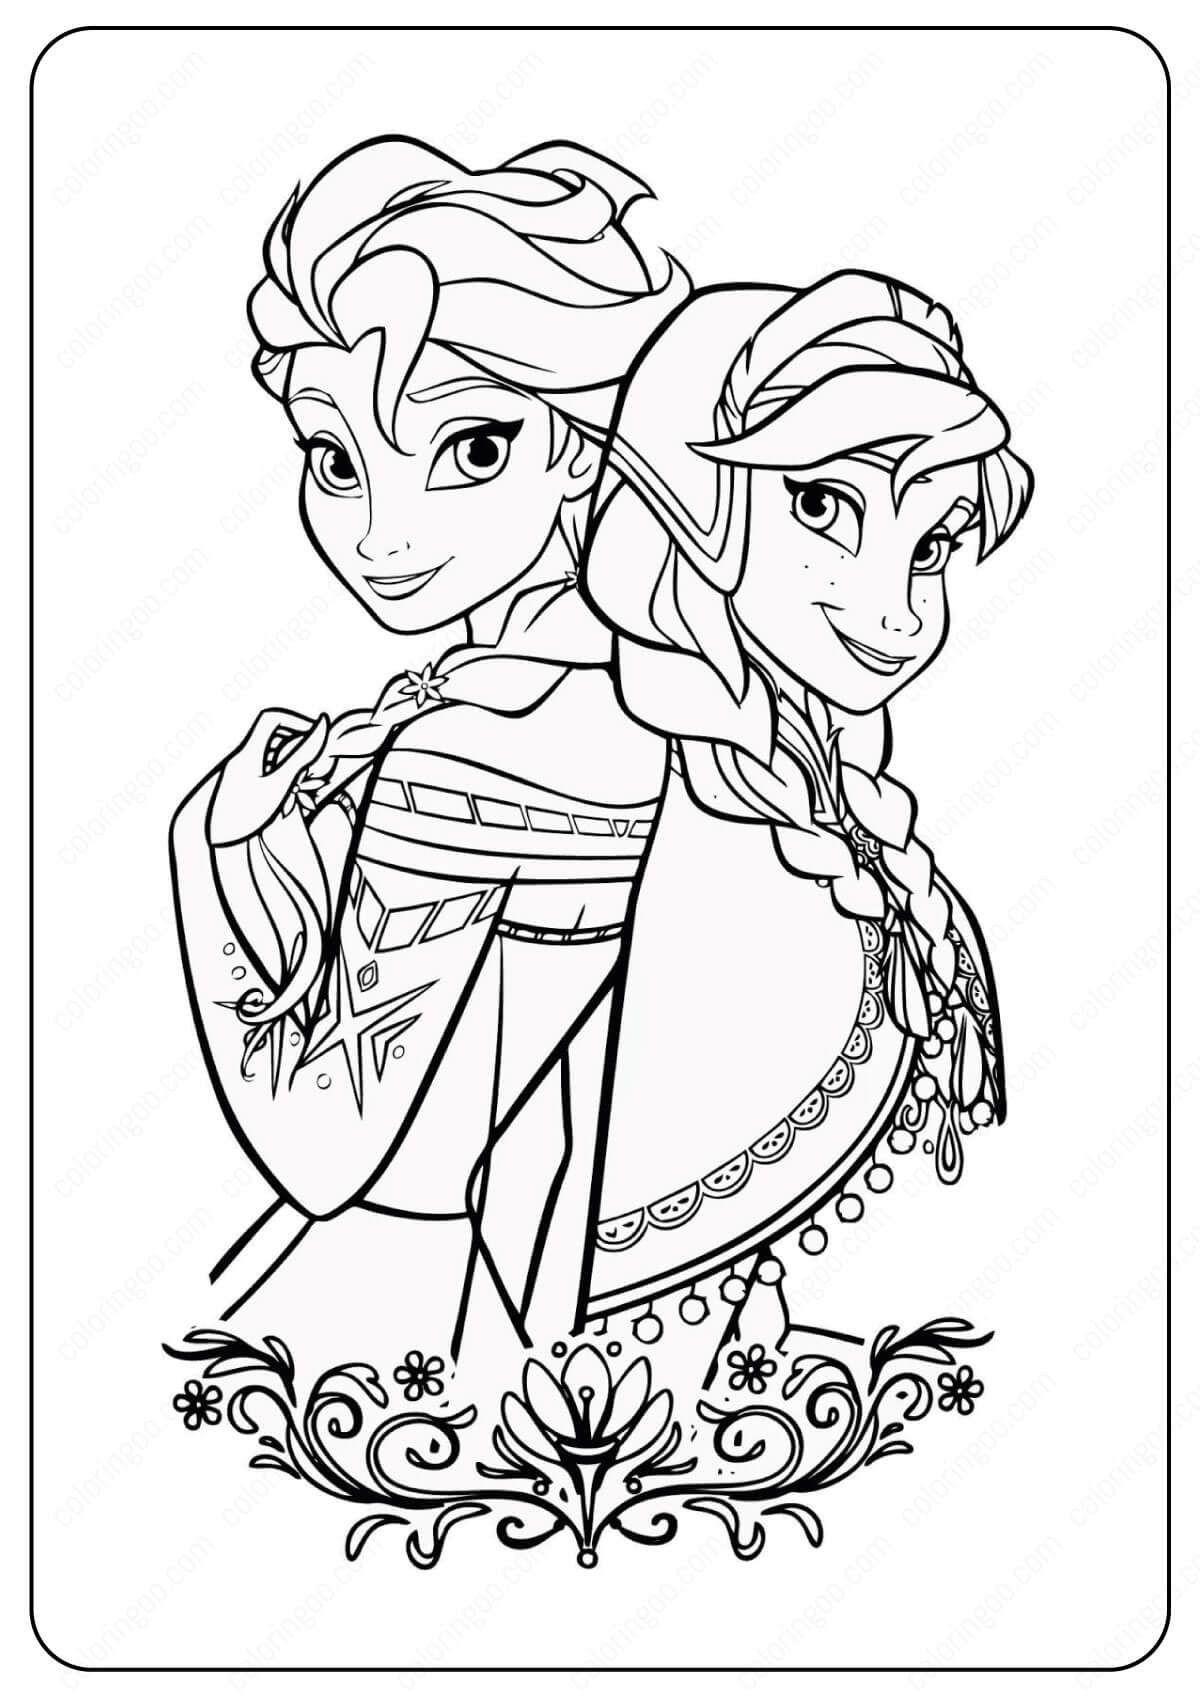 Disney Princess Coloring Pages Elsa Free Printable Frozen Anna Elsa Coloring Pages In 2020 Disney Princess Coloring Pages Elsa Coloring Pages Disney Coloring Pages